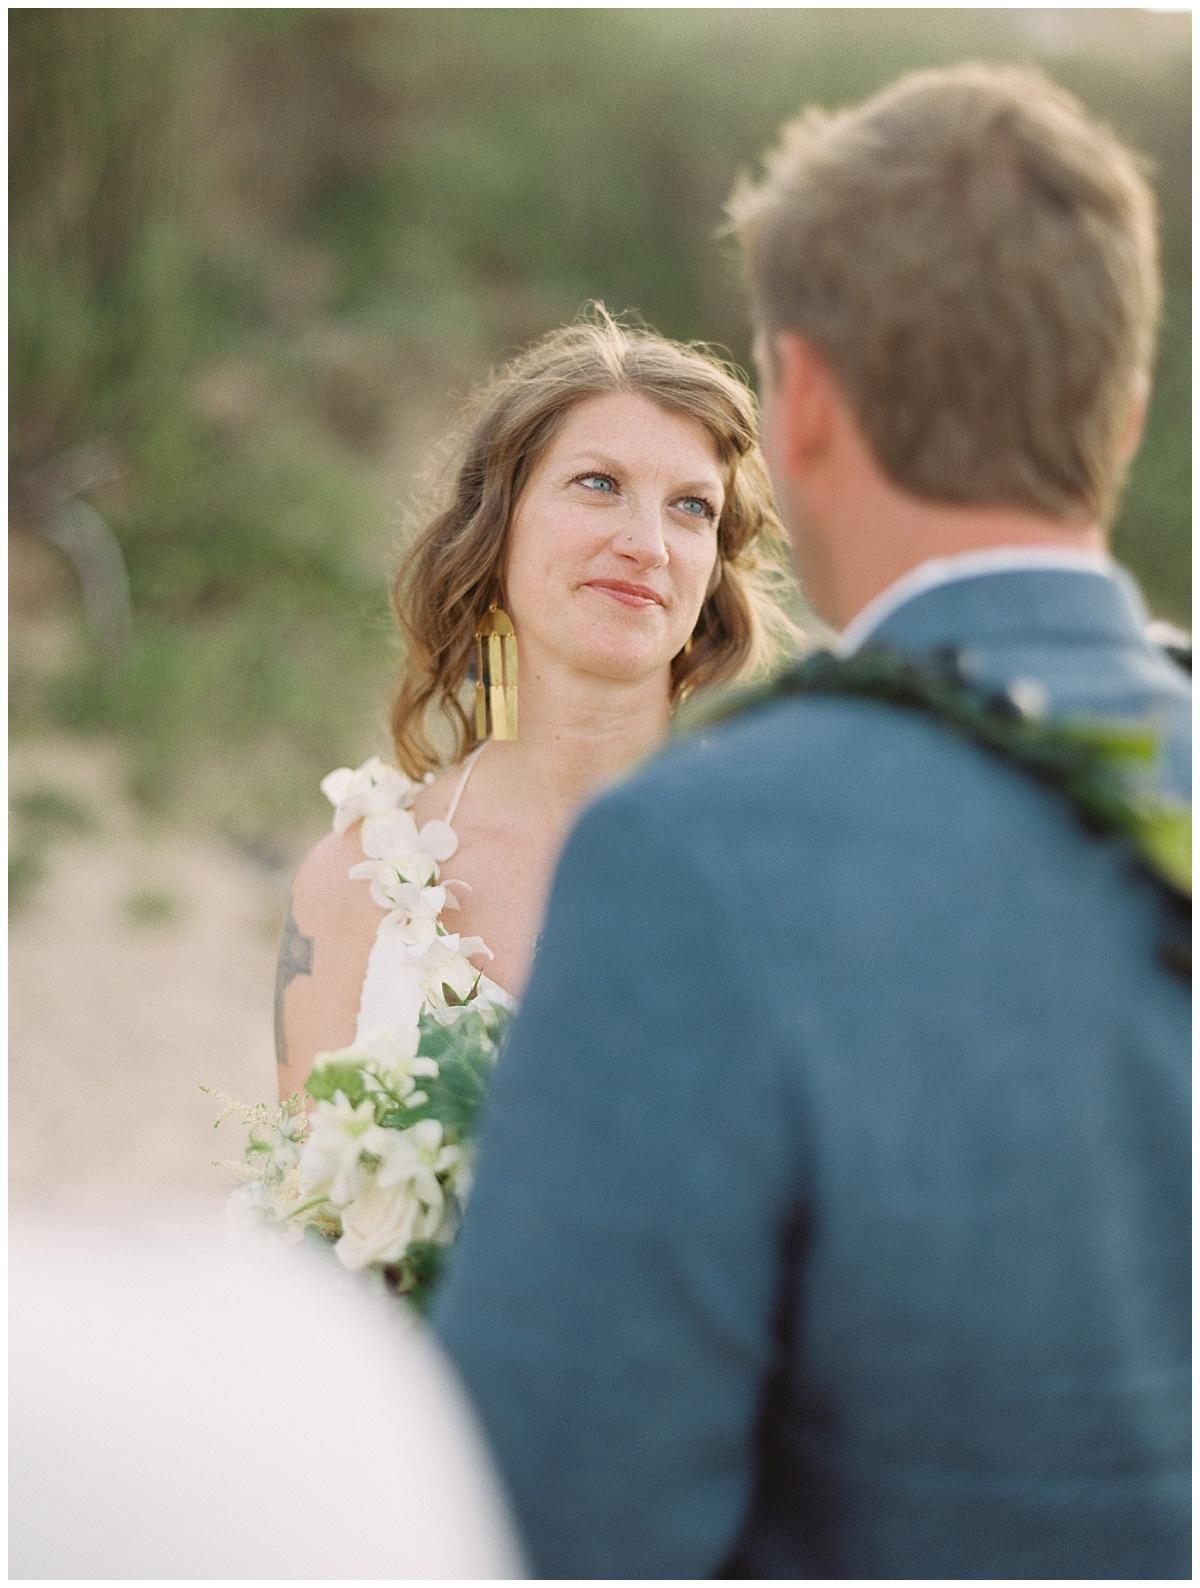 beach-elopement-bride-looking-at-groom-ceremony.jpg